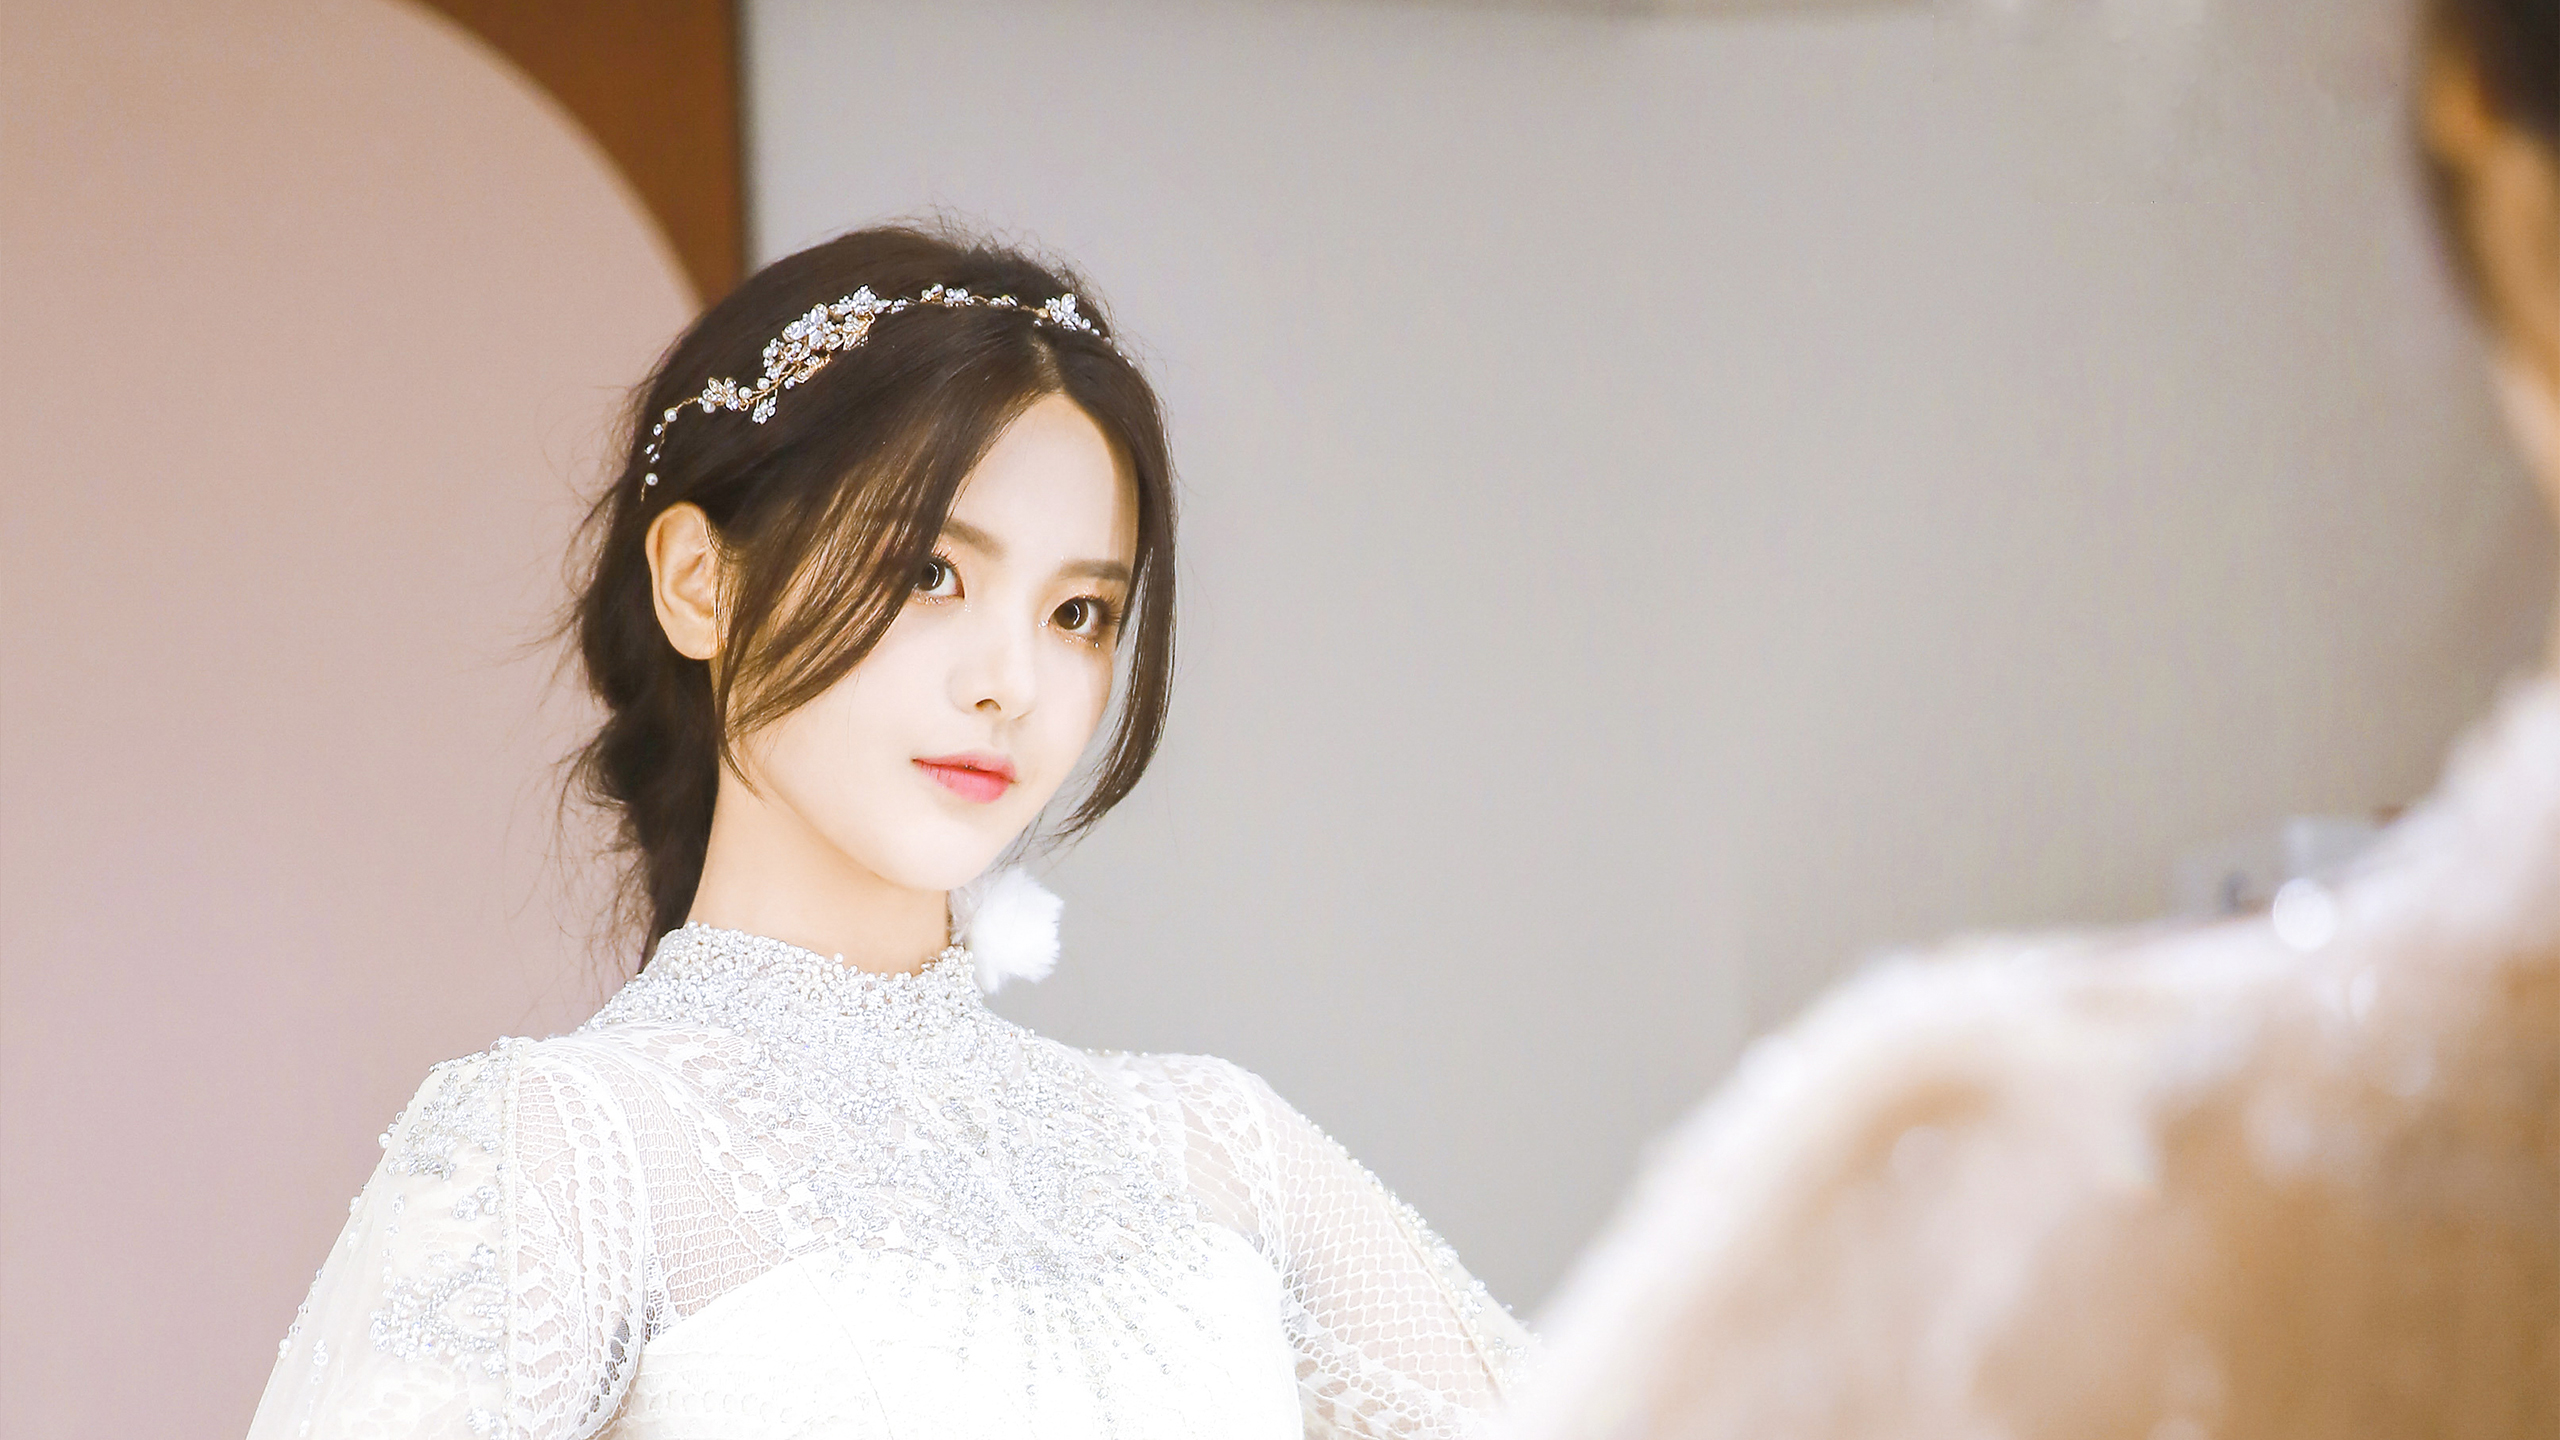 People 2560x1440 Yang Chaoyue Asian face Idol women Chinese